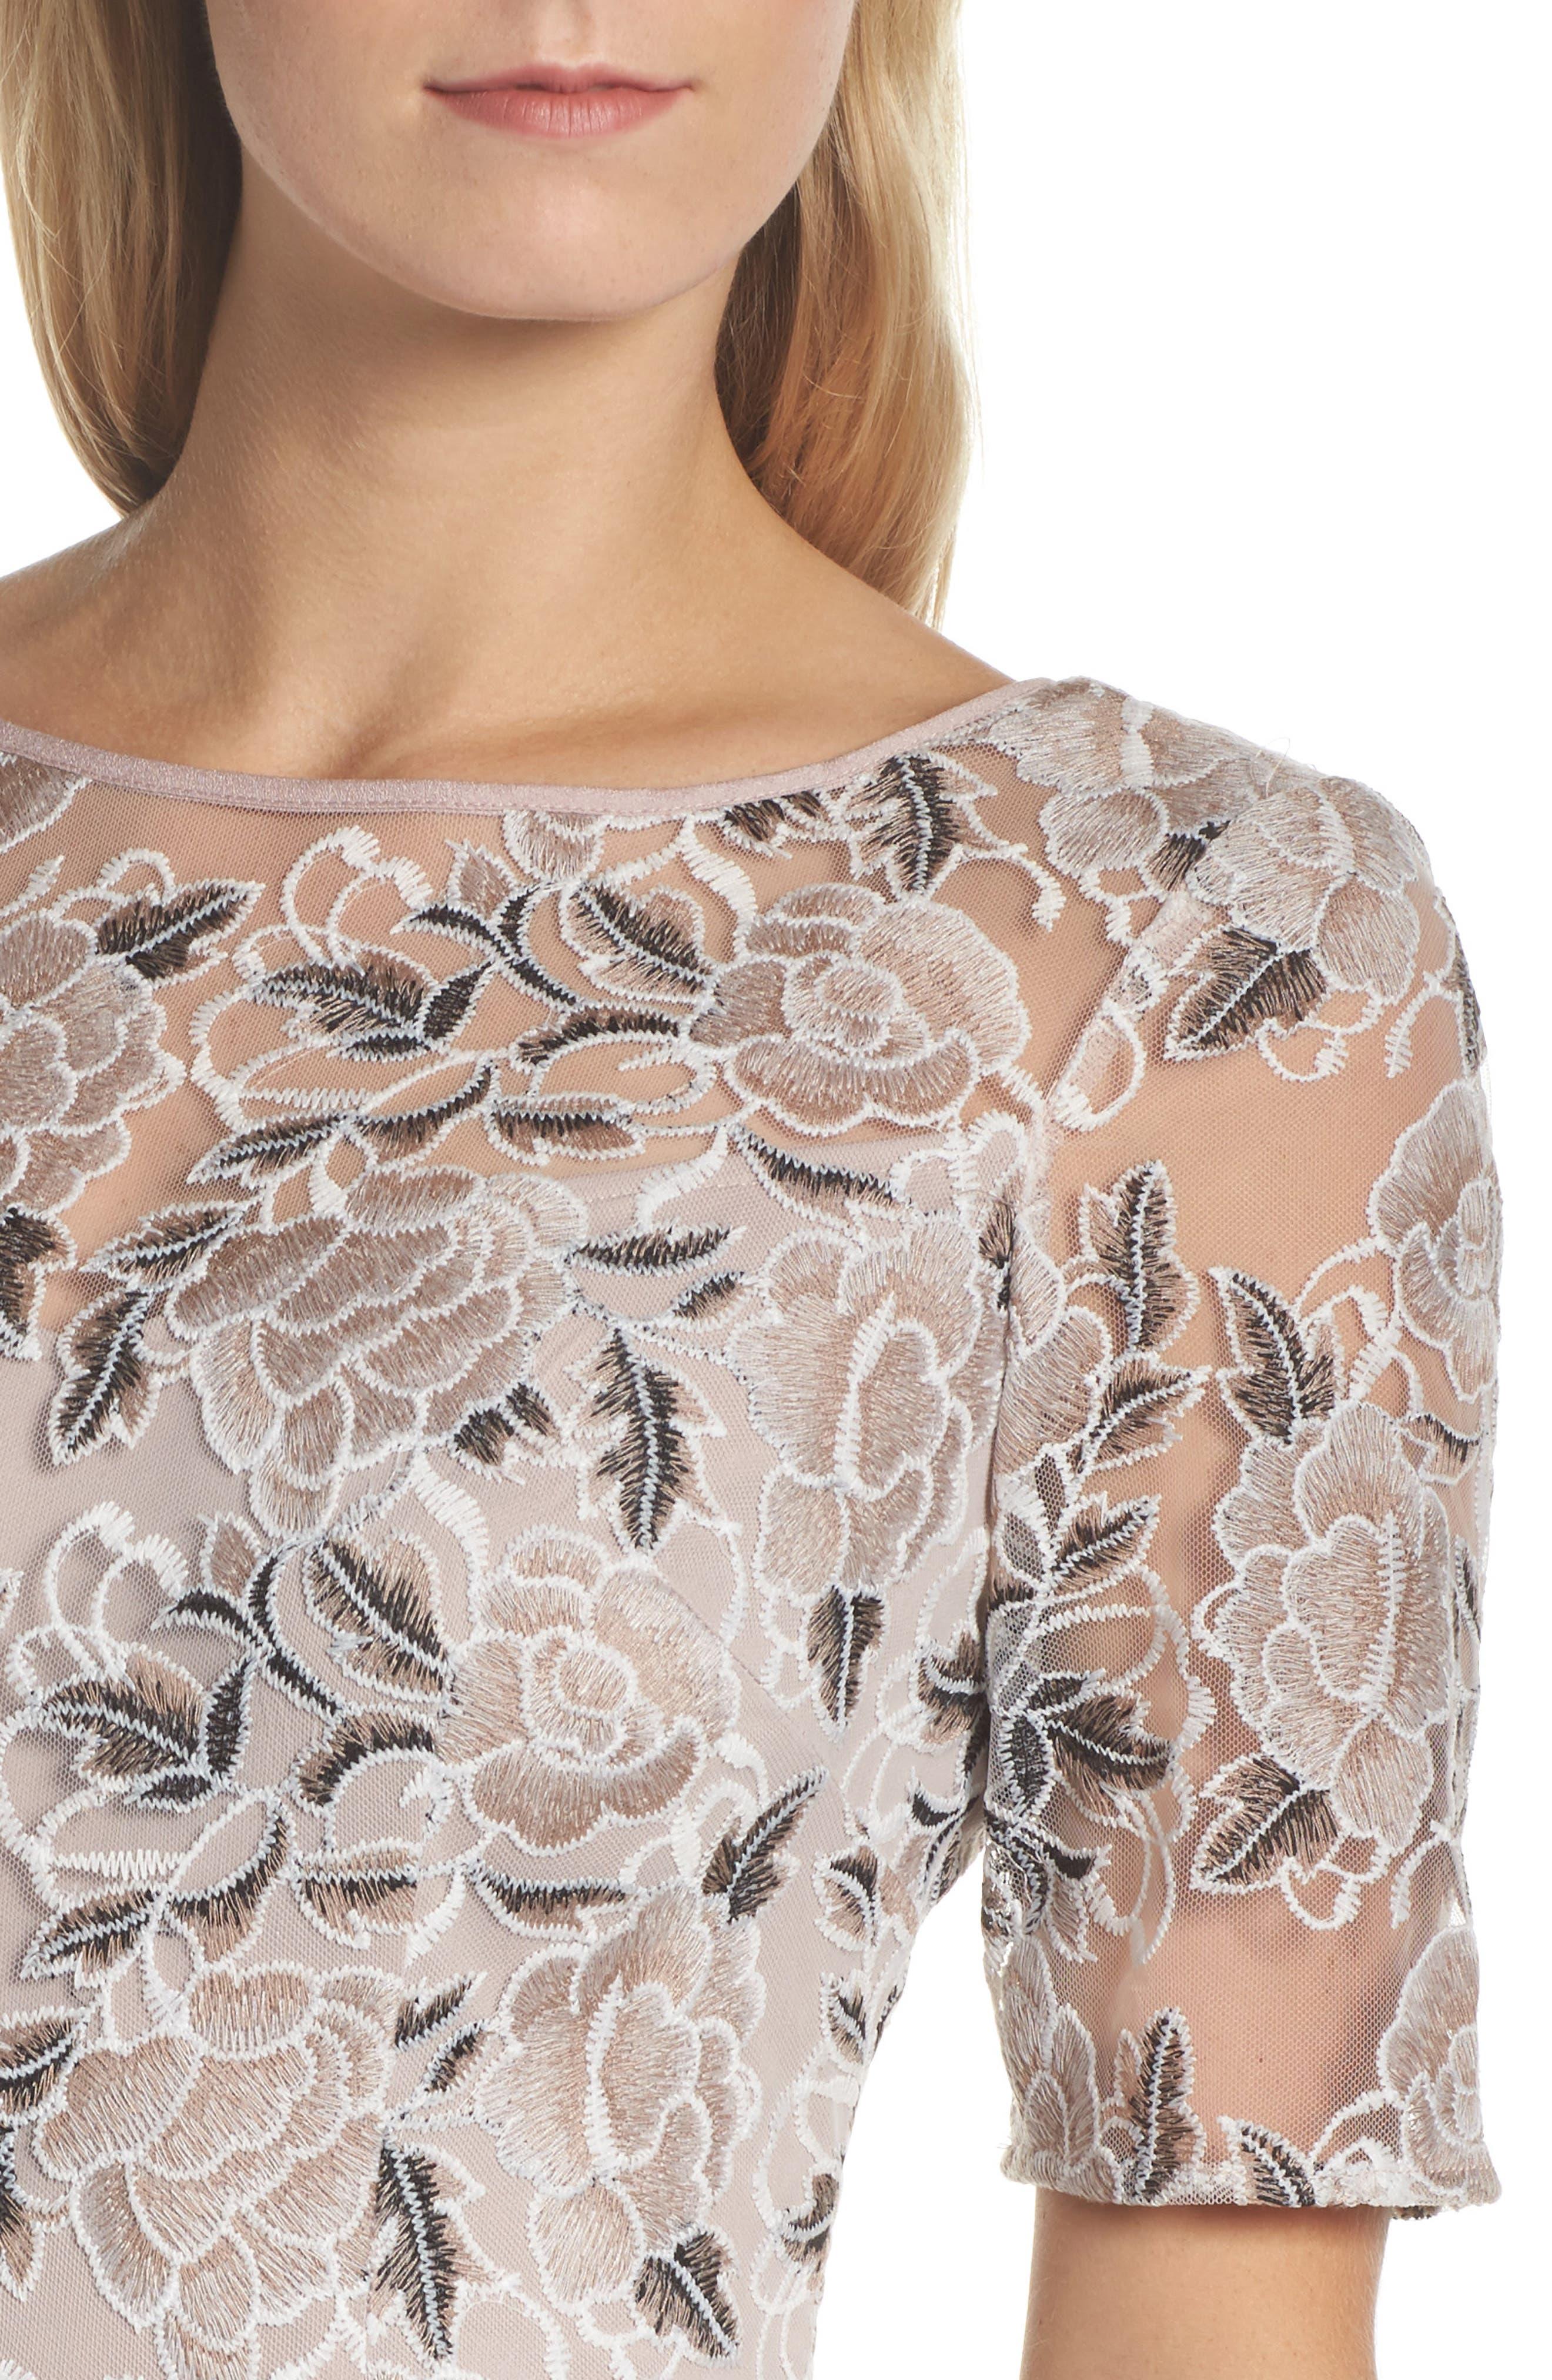 Suzette Embroidered Sheath Dress,                             Alternate thumbnail 4, color,